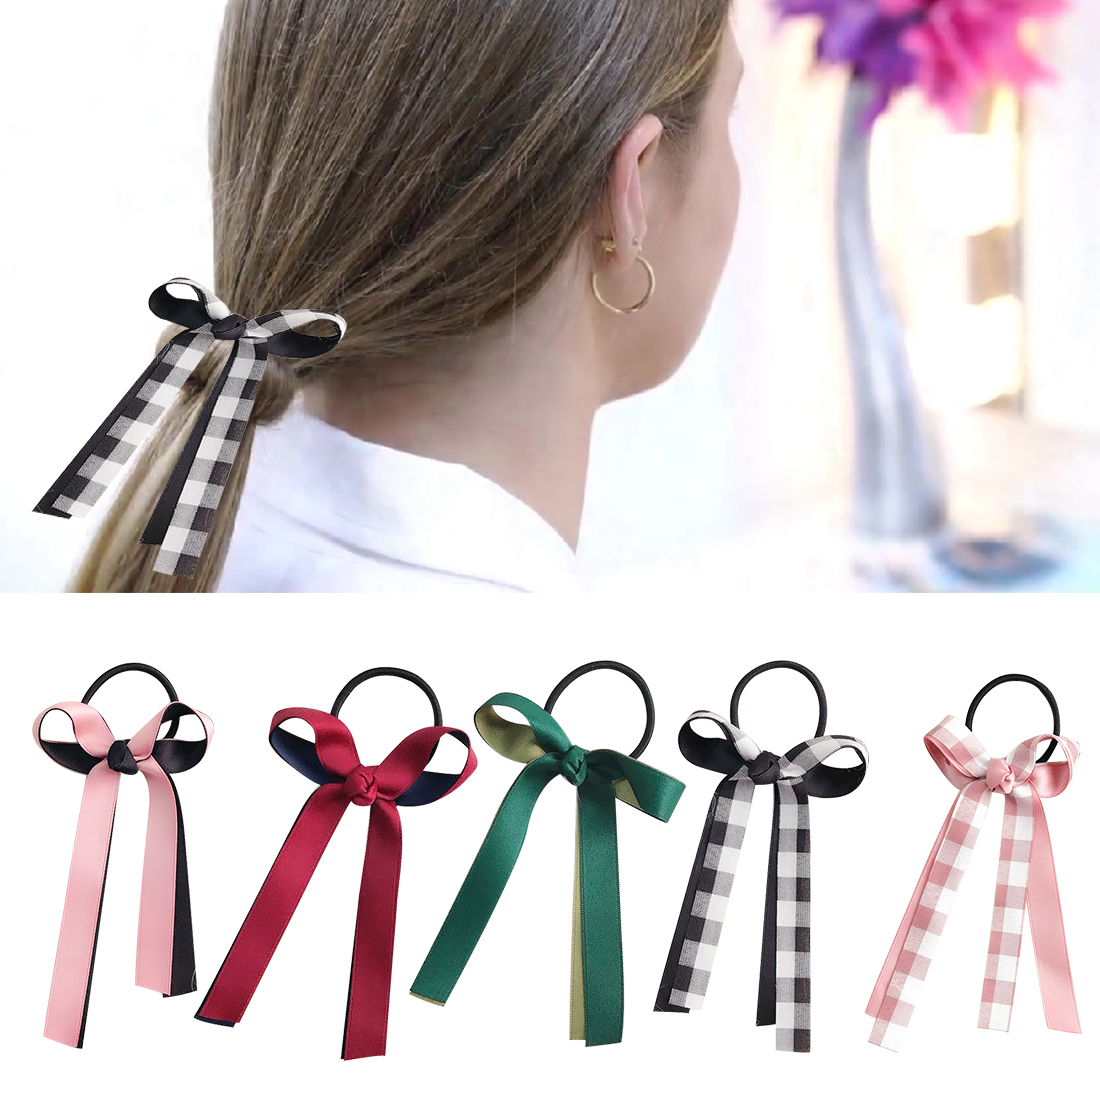 Humor Women Cute Hair Accessories Para El Pelo Plaid Bow Bowknot Elastic Hair Bands Tie Gum Ponytail Girls Headbands Hair Ropes Back To Search Resultsapparel Accessories